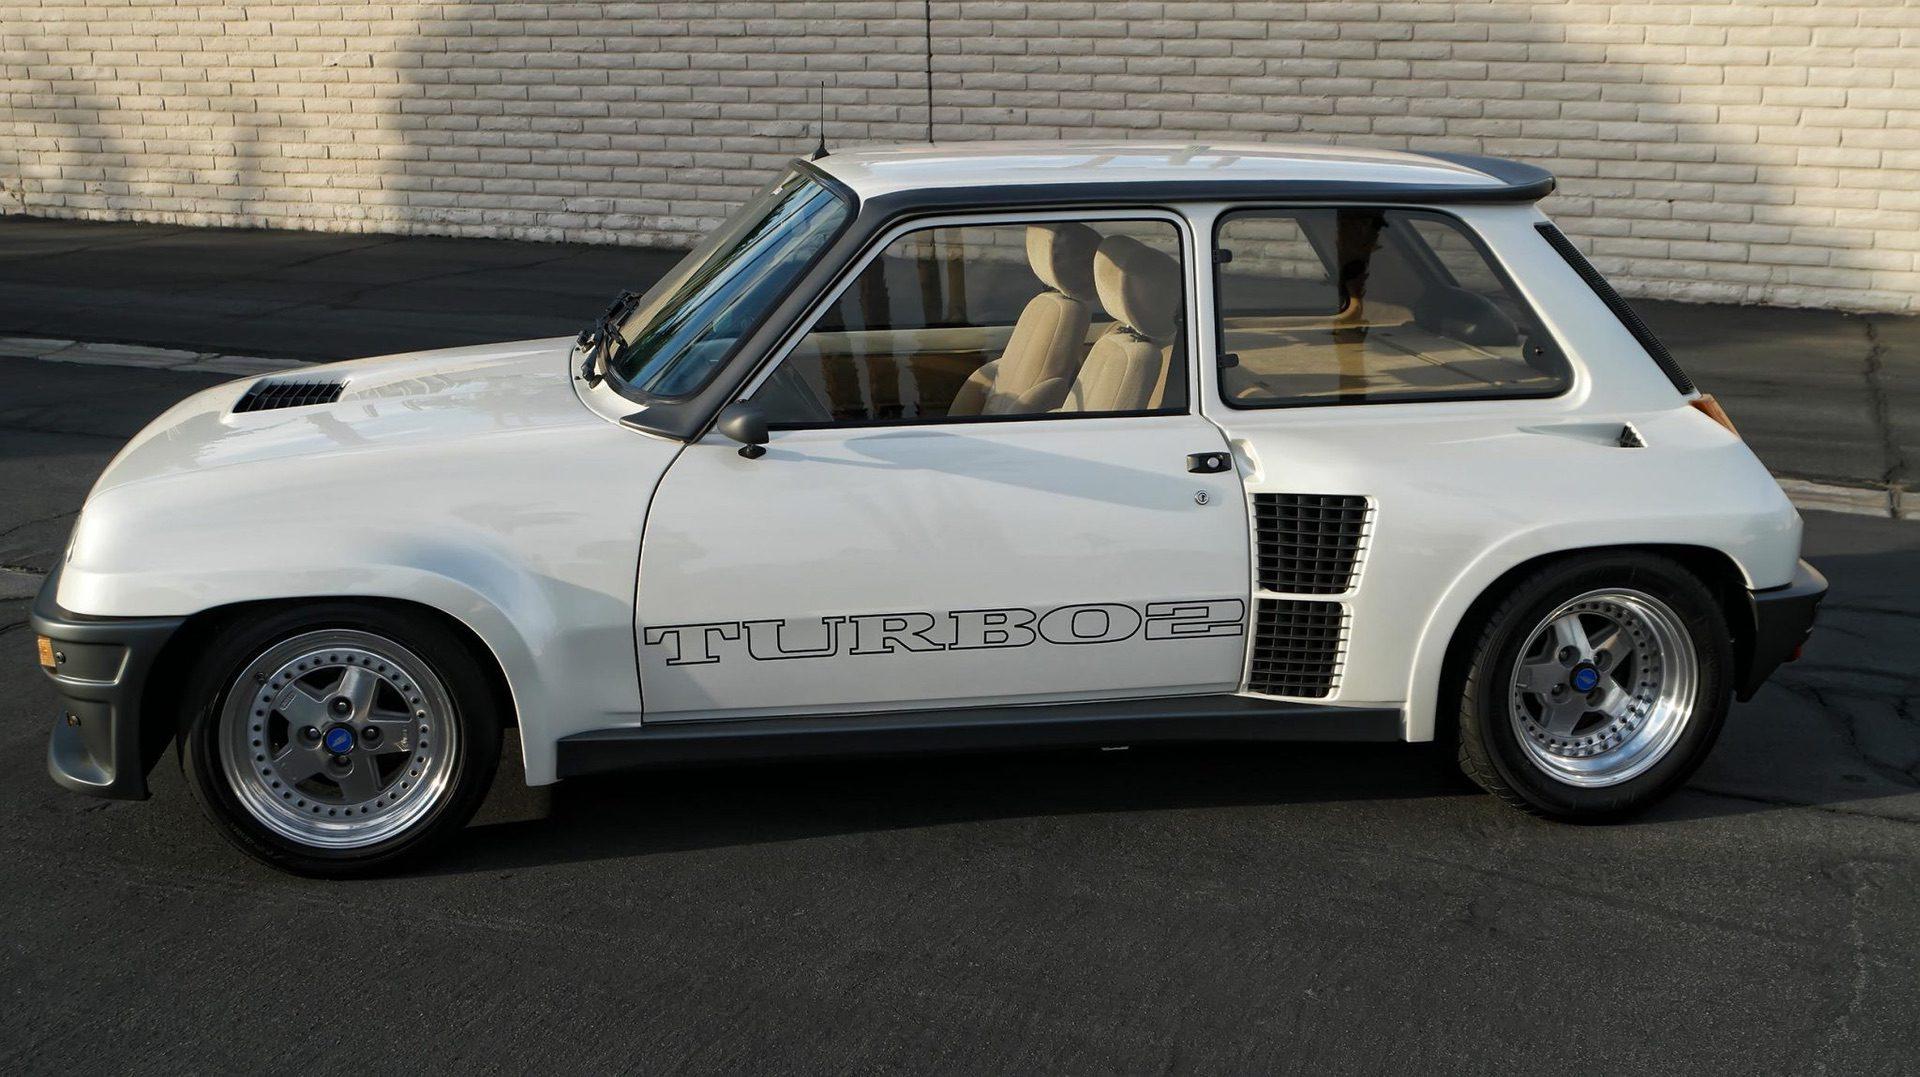 1985_Renault_R5_Turbo_2_rotary-0027